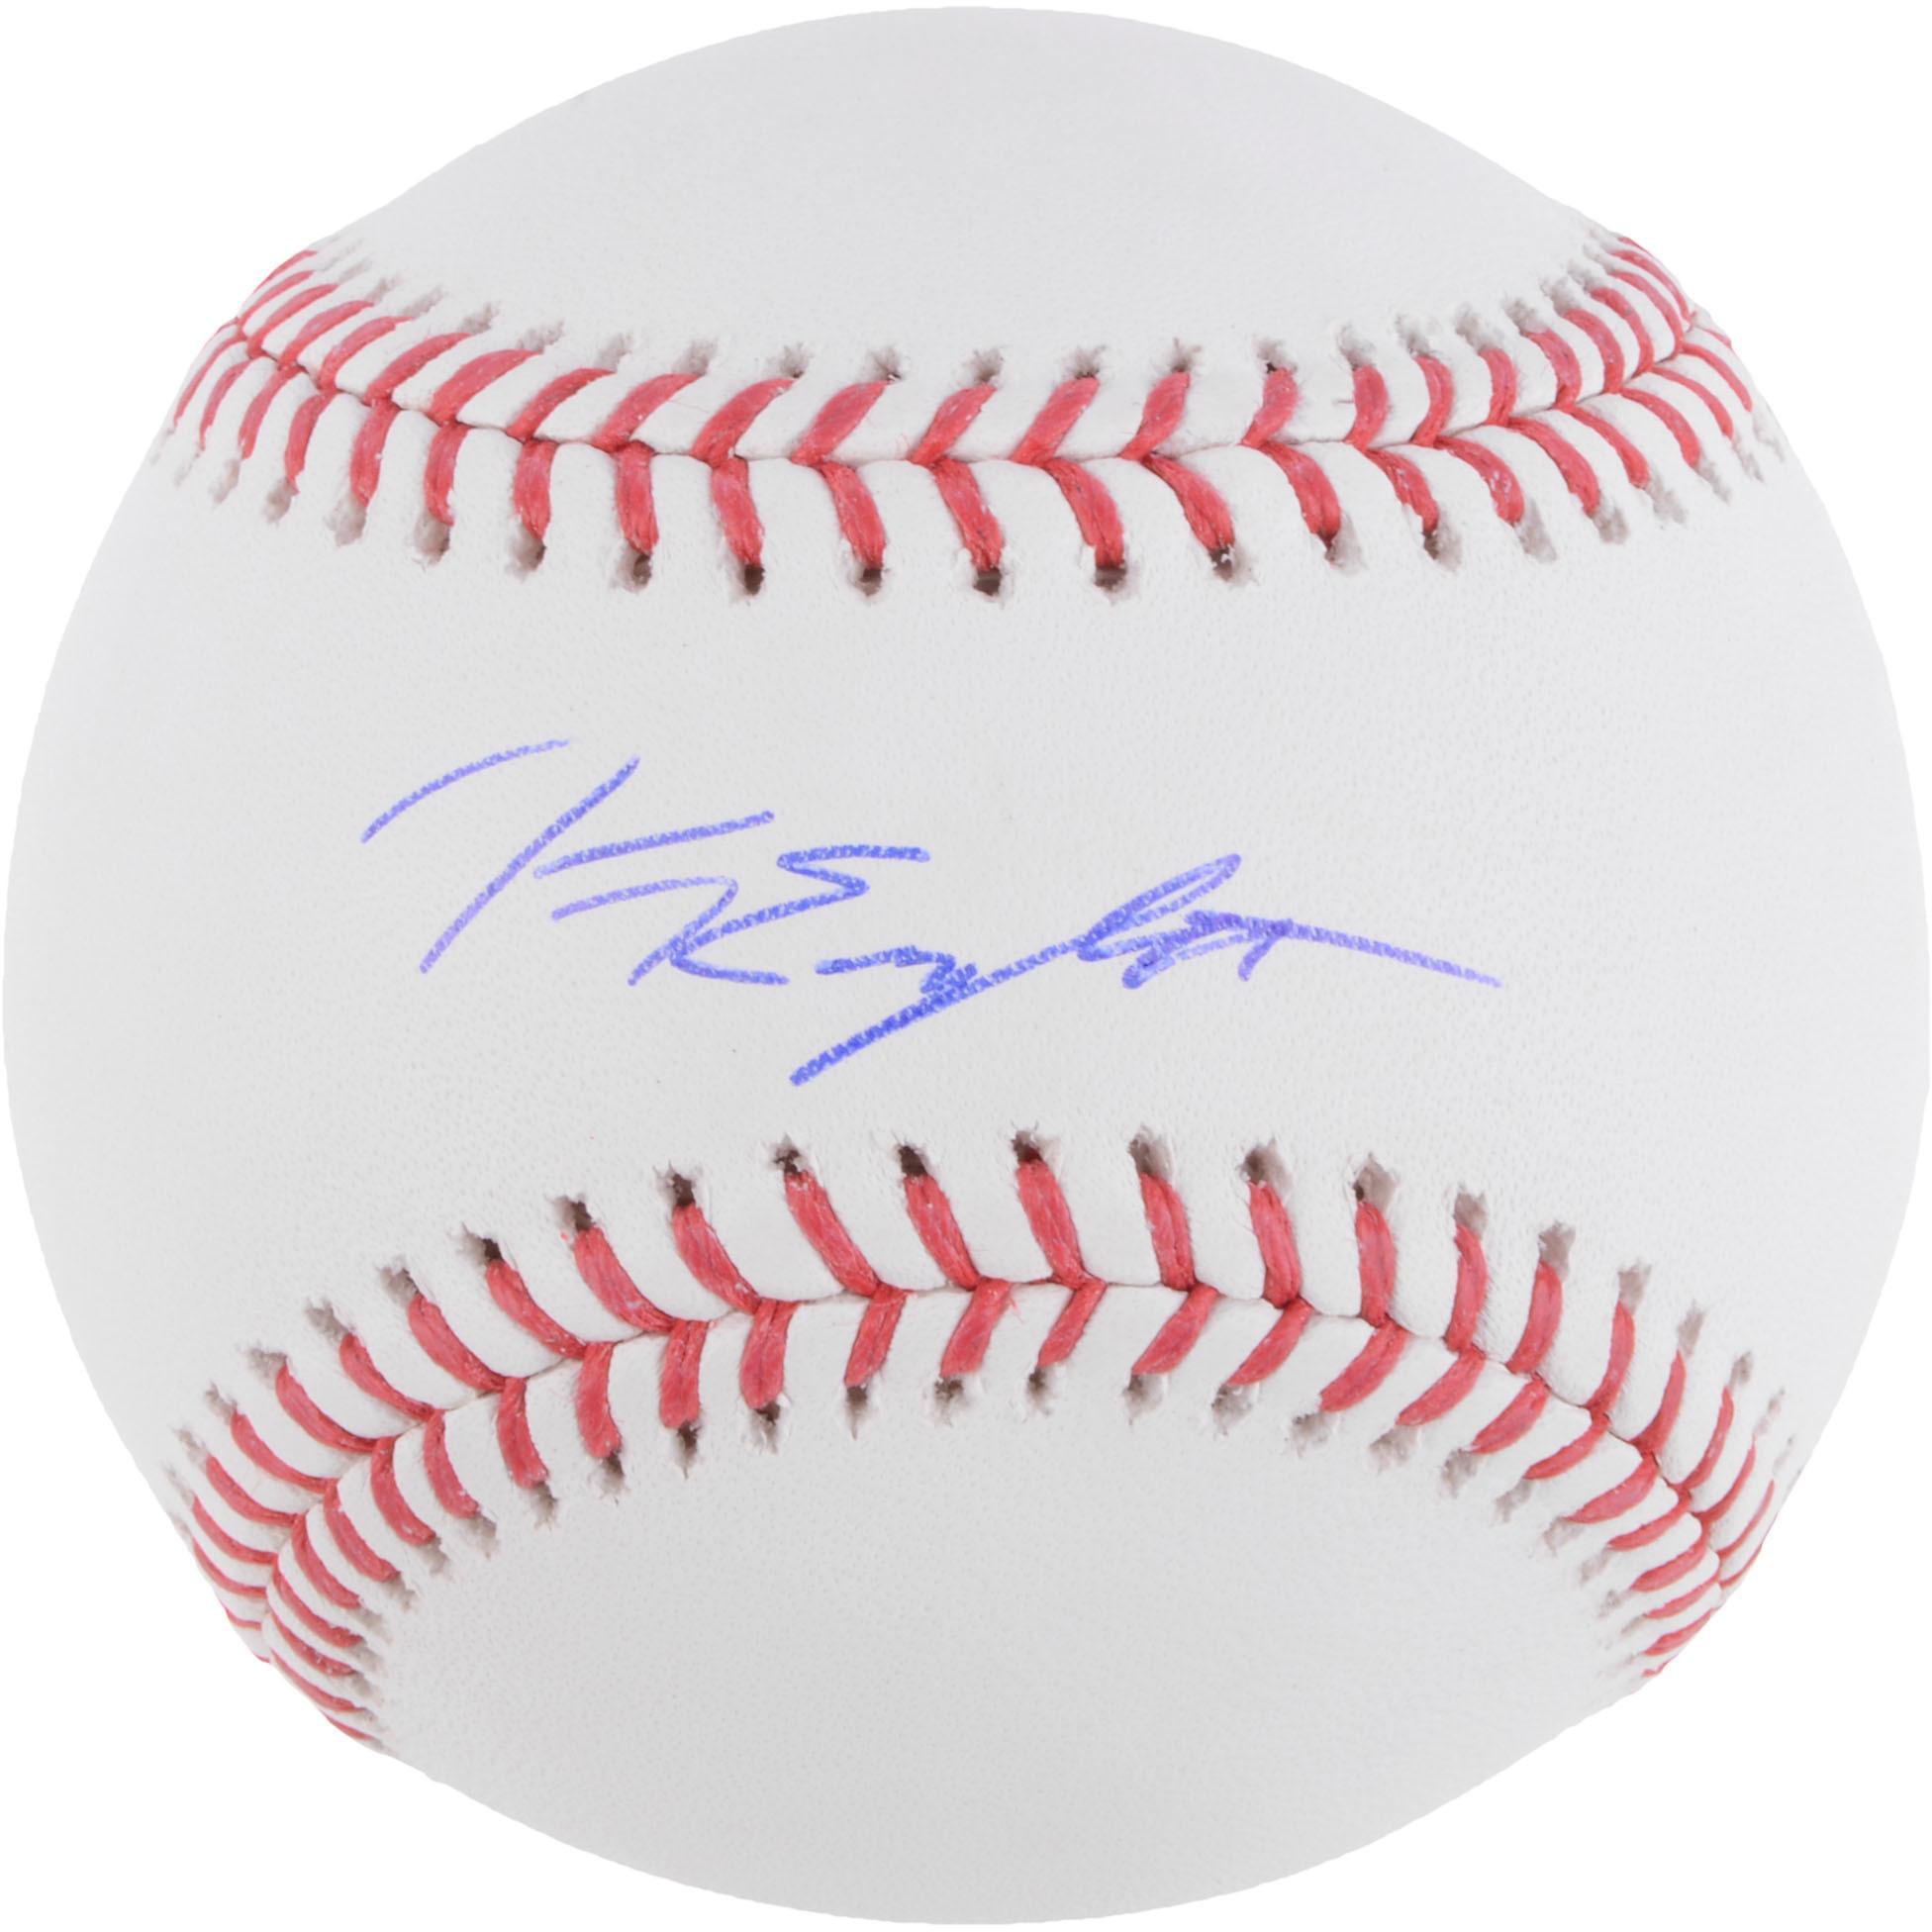 Kole Enright Texas Rangers Autographed Baseball - Fanatics Authentic Certified